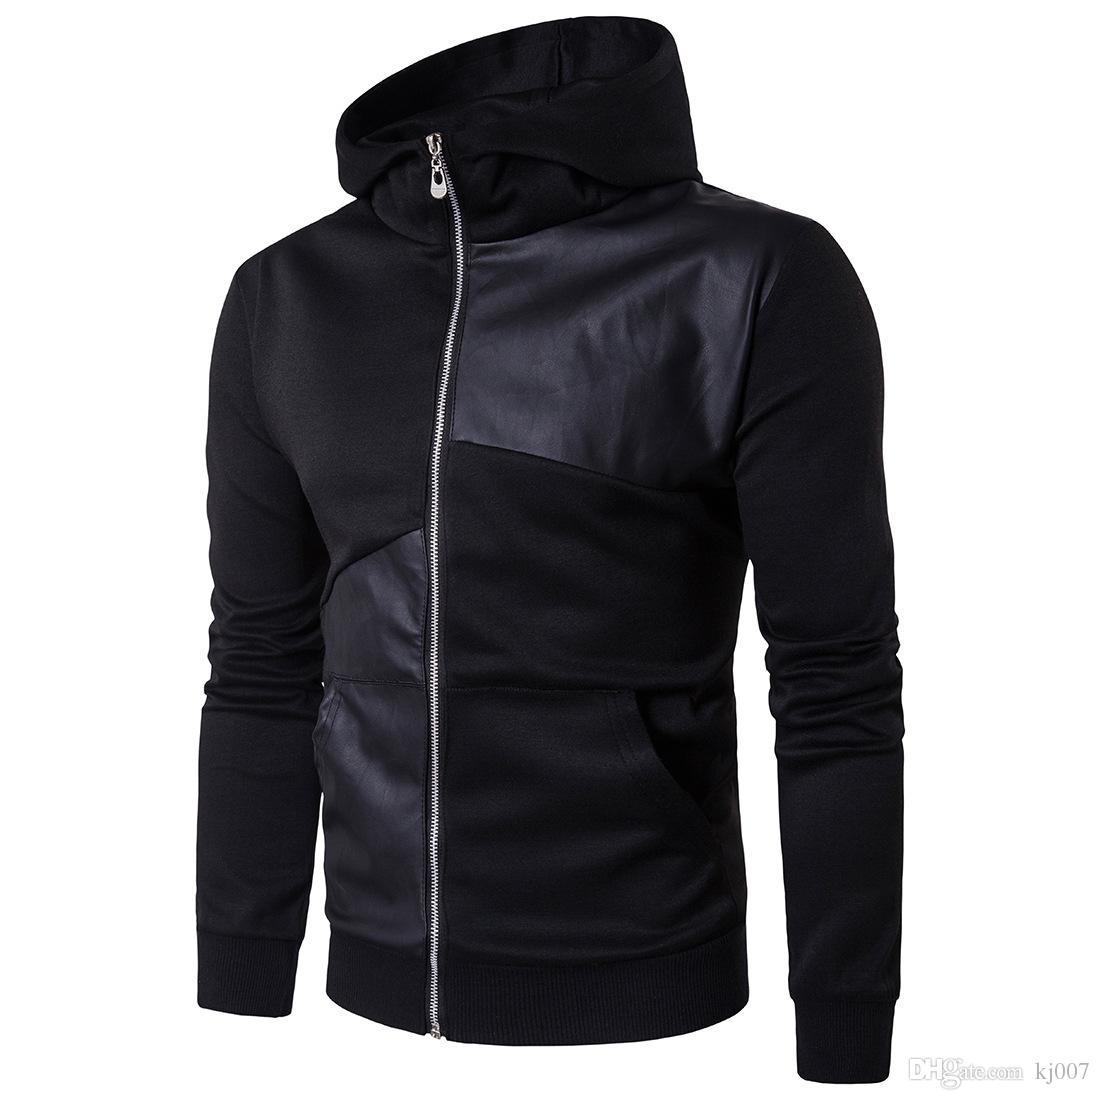 Men's Hoodies Long Sleeve Patchwork Hoodie Streetwear Turtleneck Pullover Hooded Cotton Leather Hip Hop Sweatshirt England Style Hot Sales